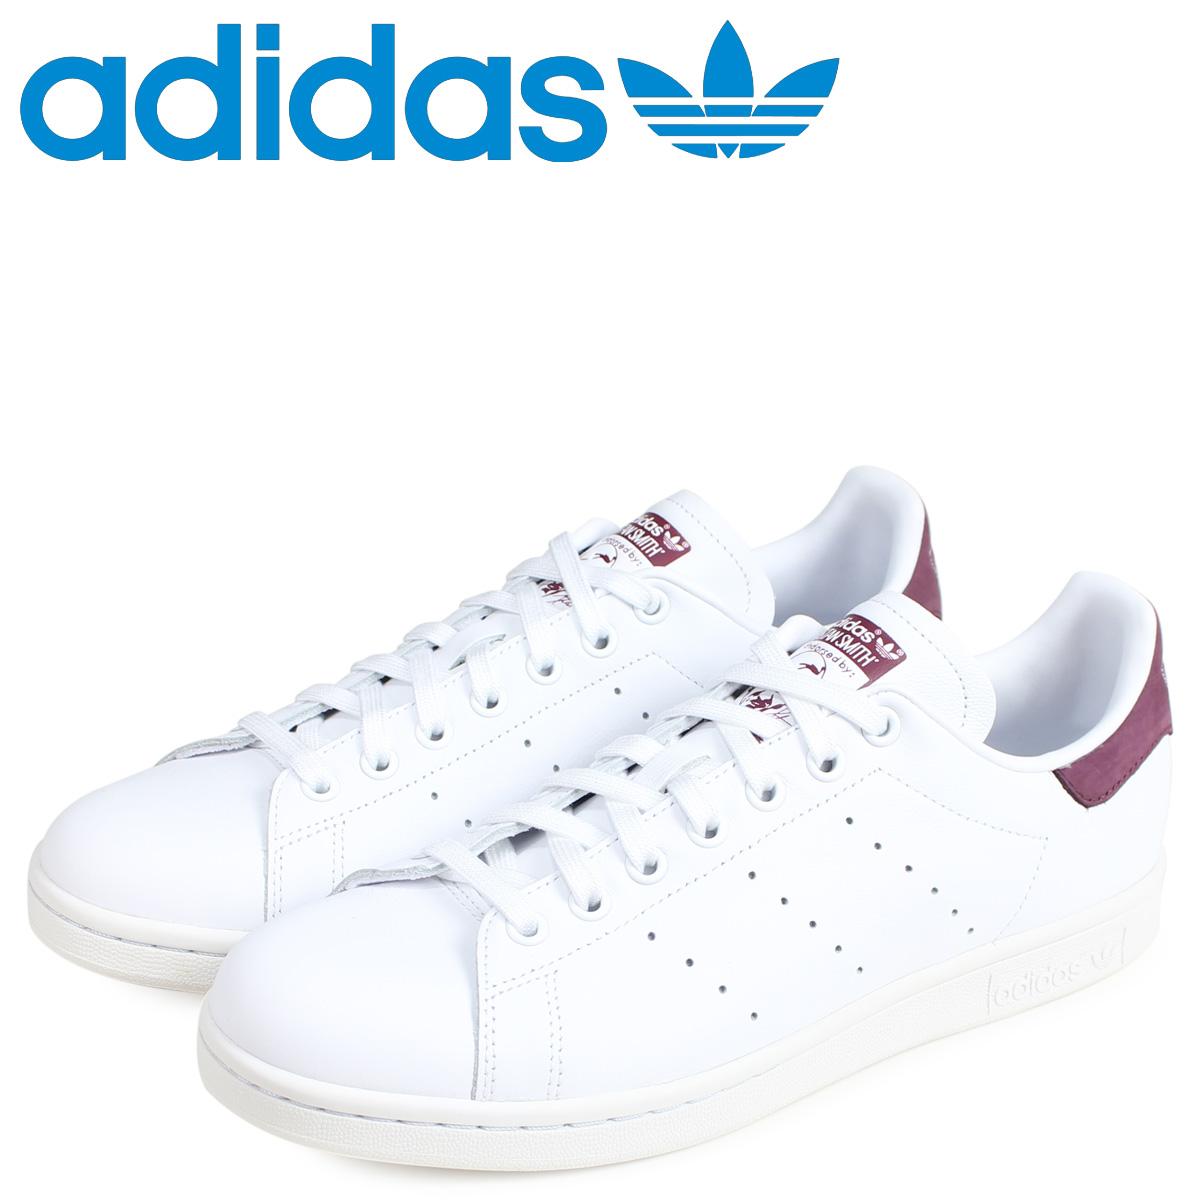 adidas Originals アディダス オリジナルス スタンスミス スニーカー メンズ STAN SMITH ホワイト 白 DB3526